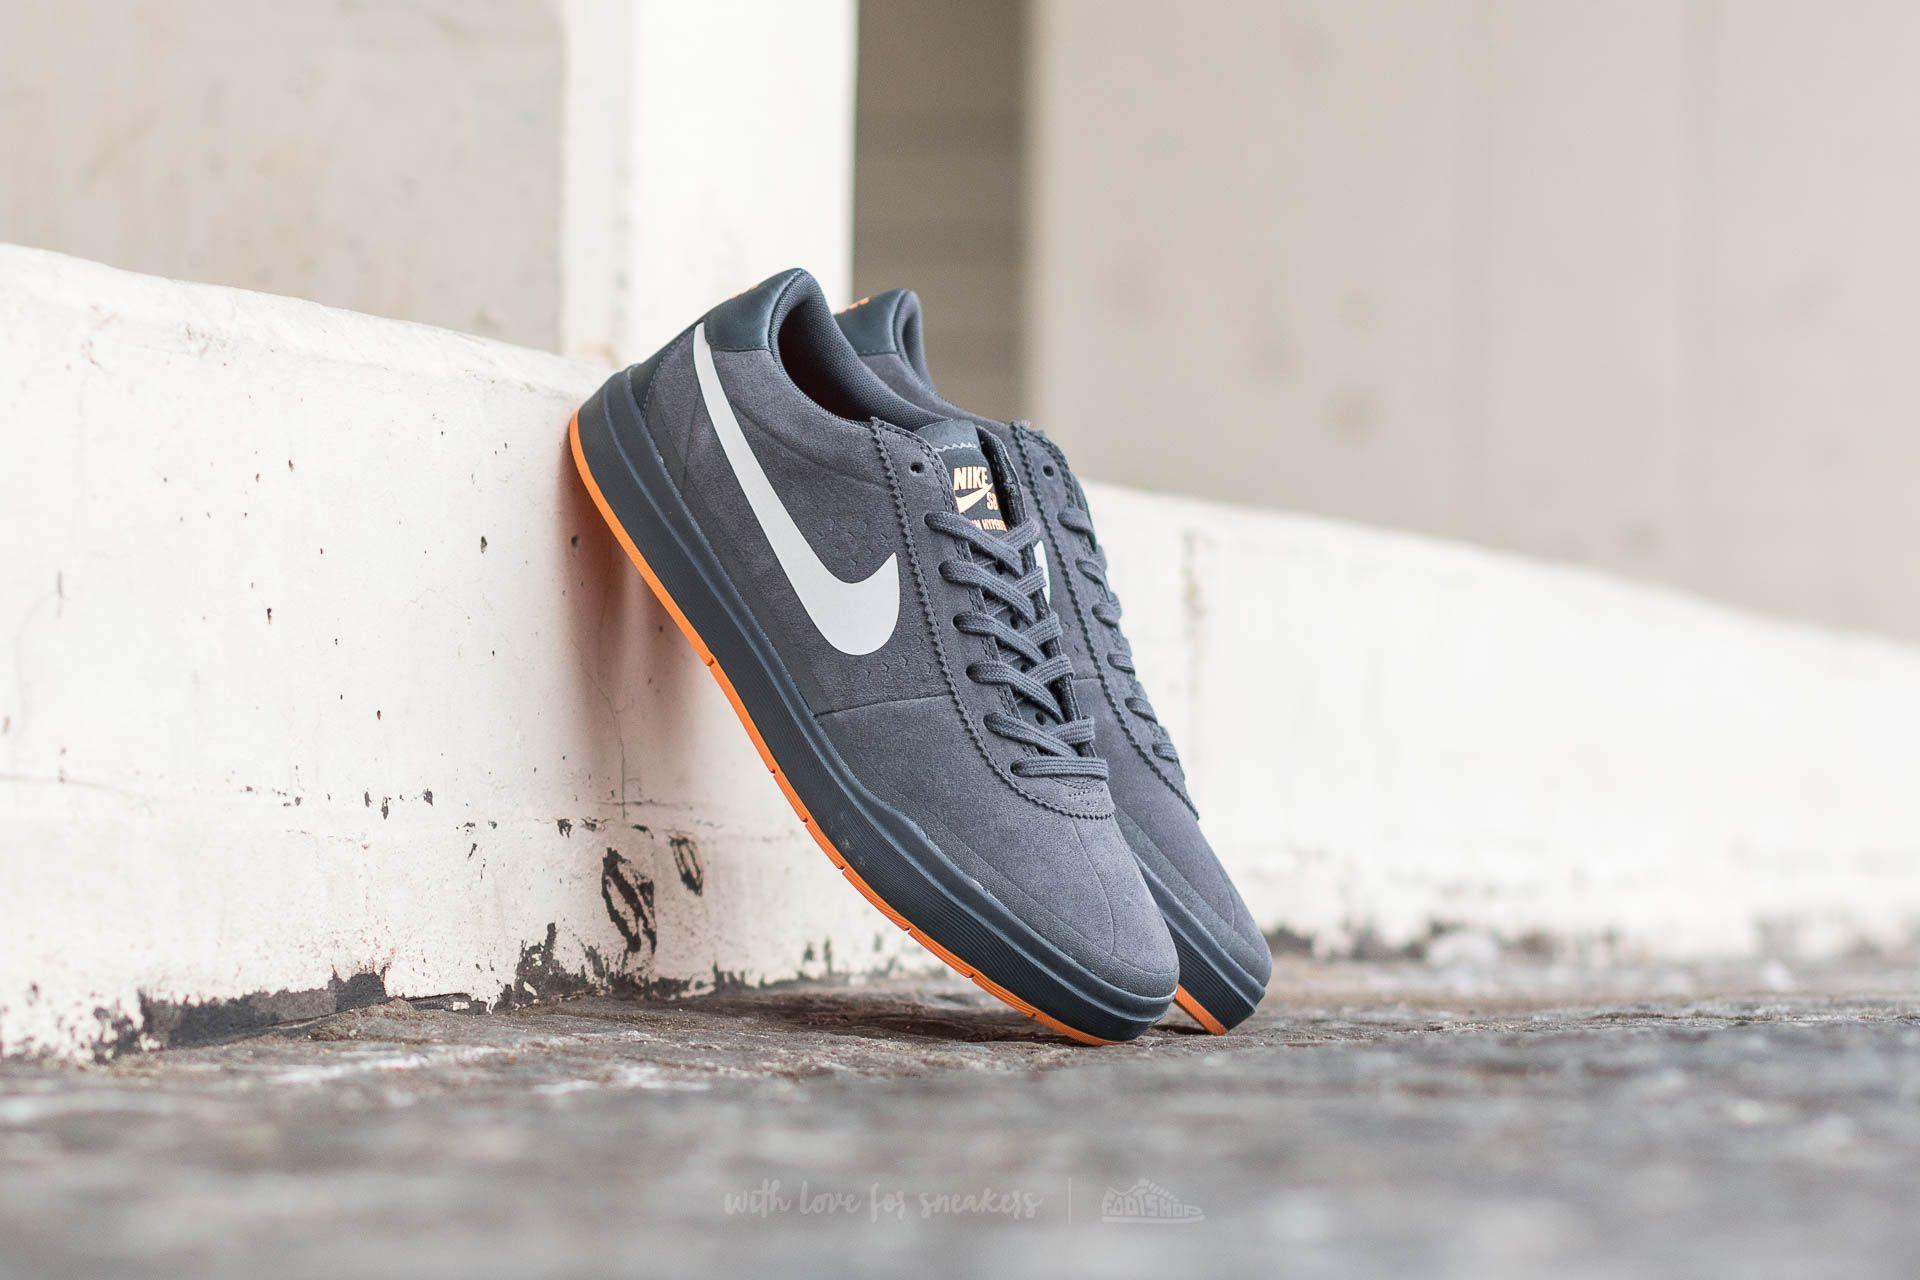 b61d7ffa195 Nike Bruin SB Hyperfeel XT Anthracite  White-Clay Orange